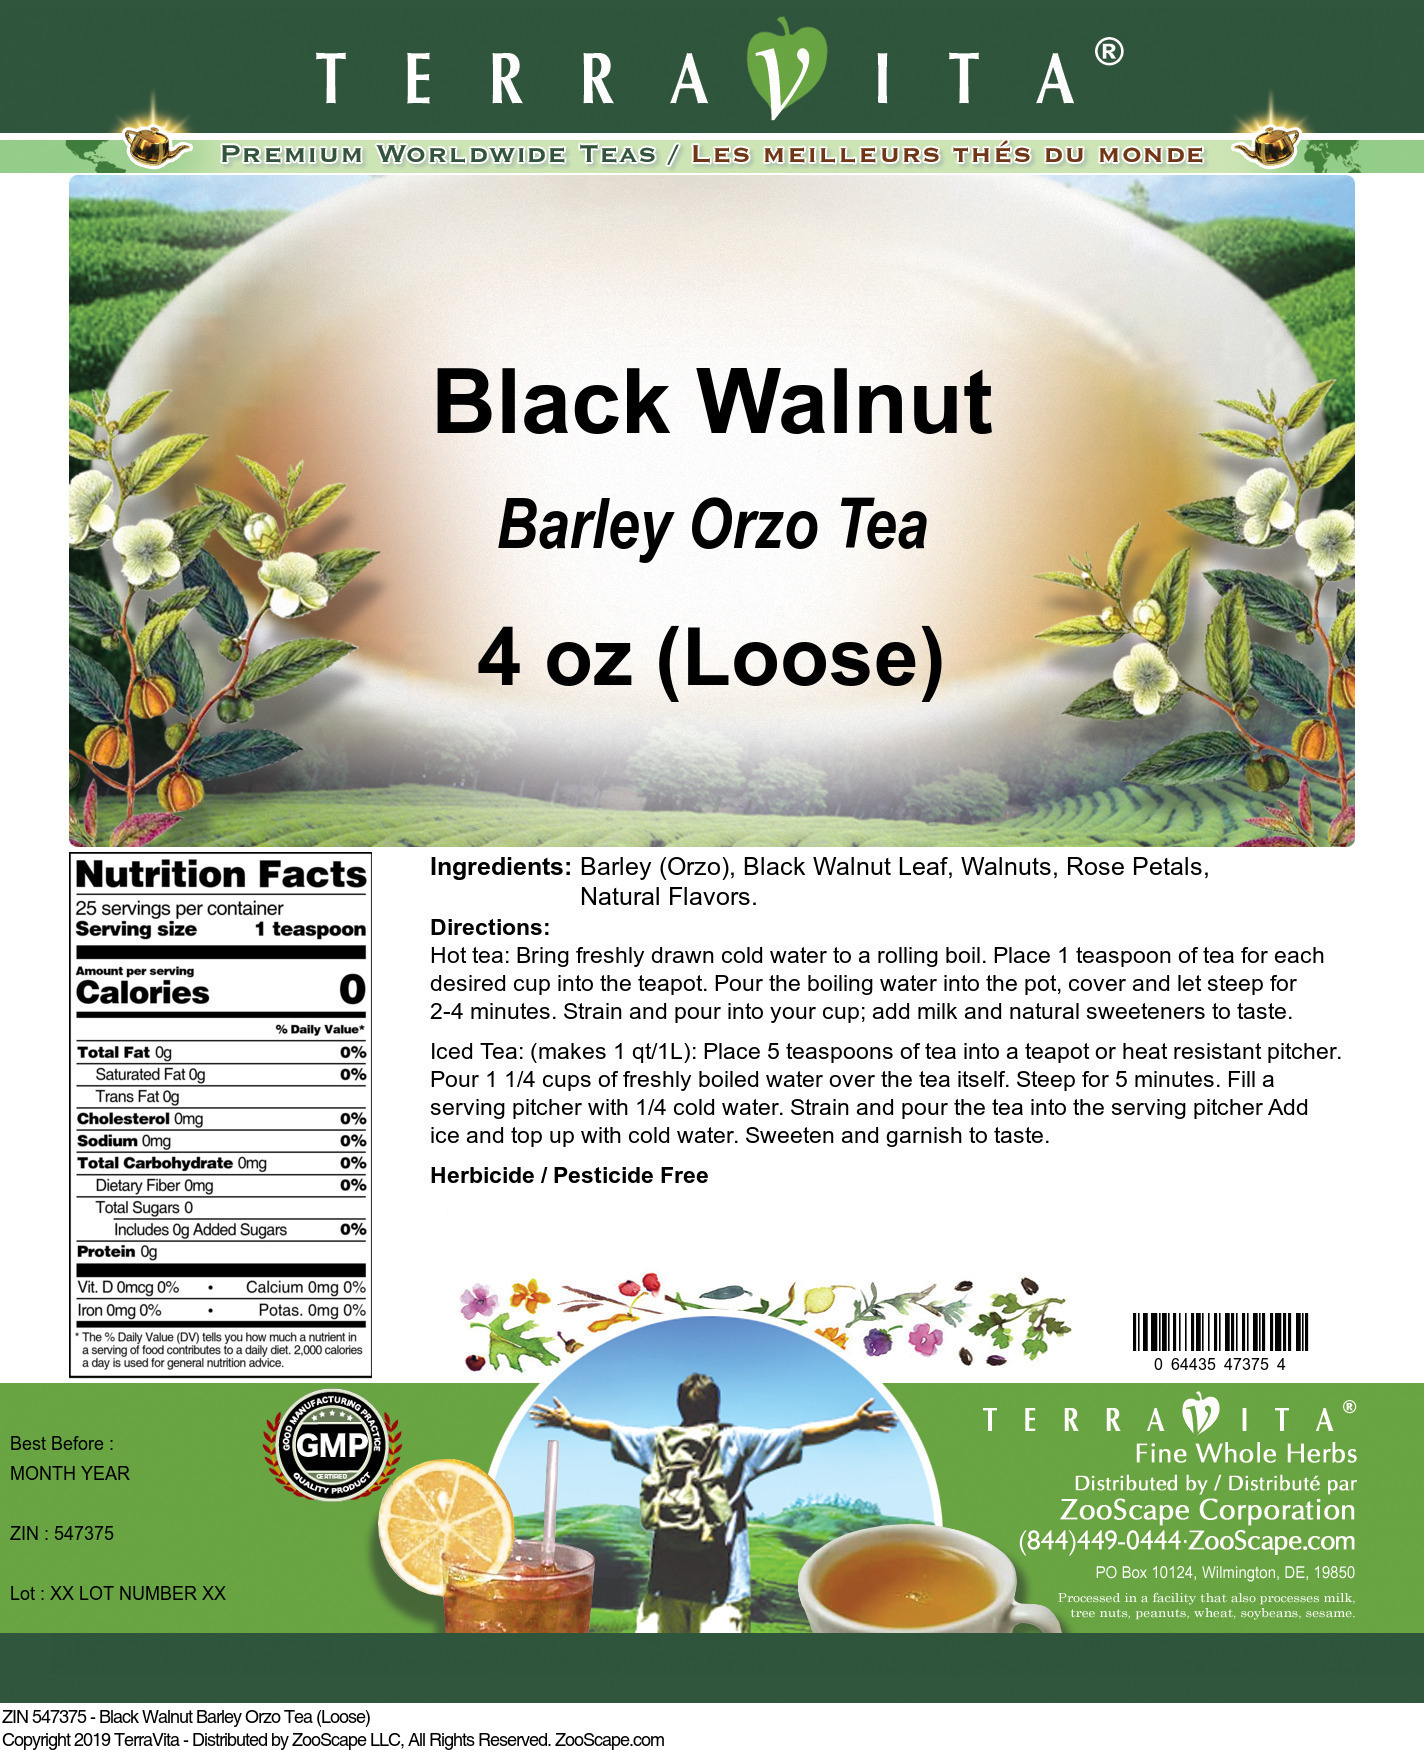 Black Walnut Barley Orzo